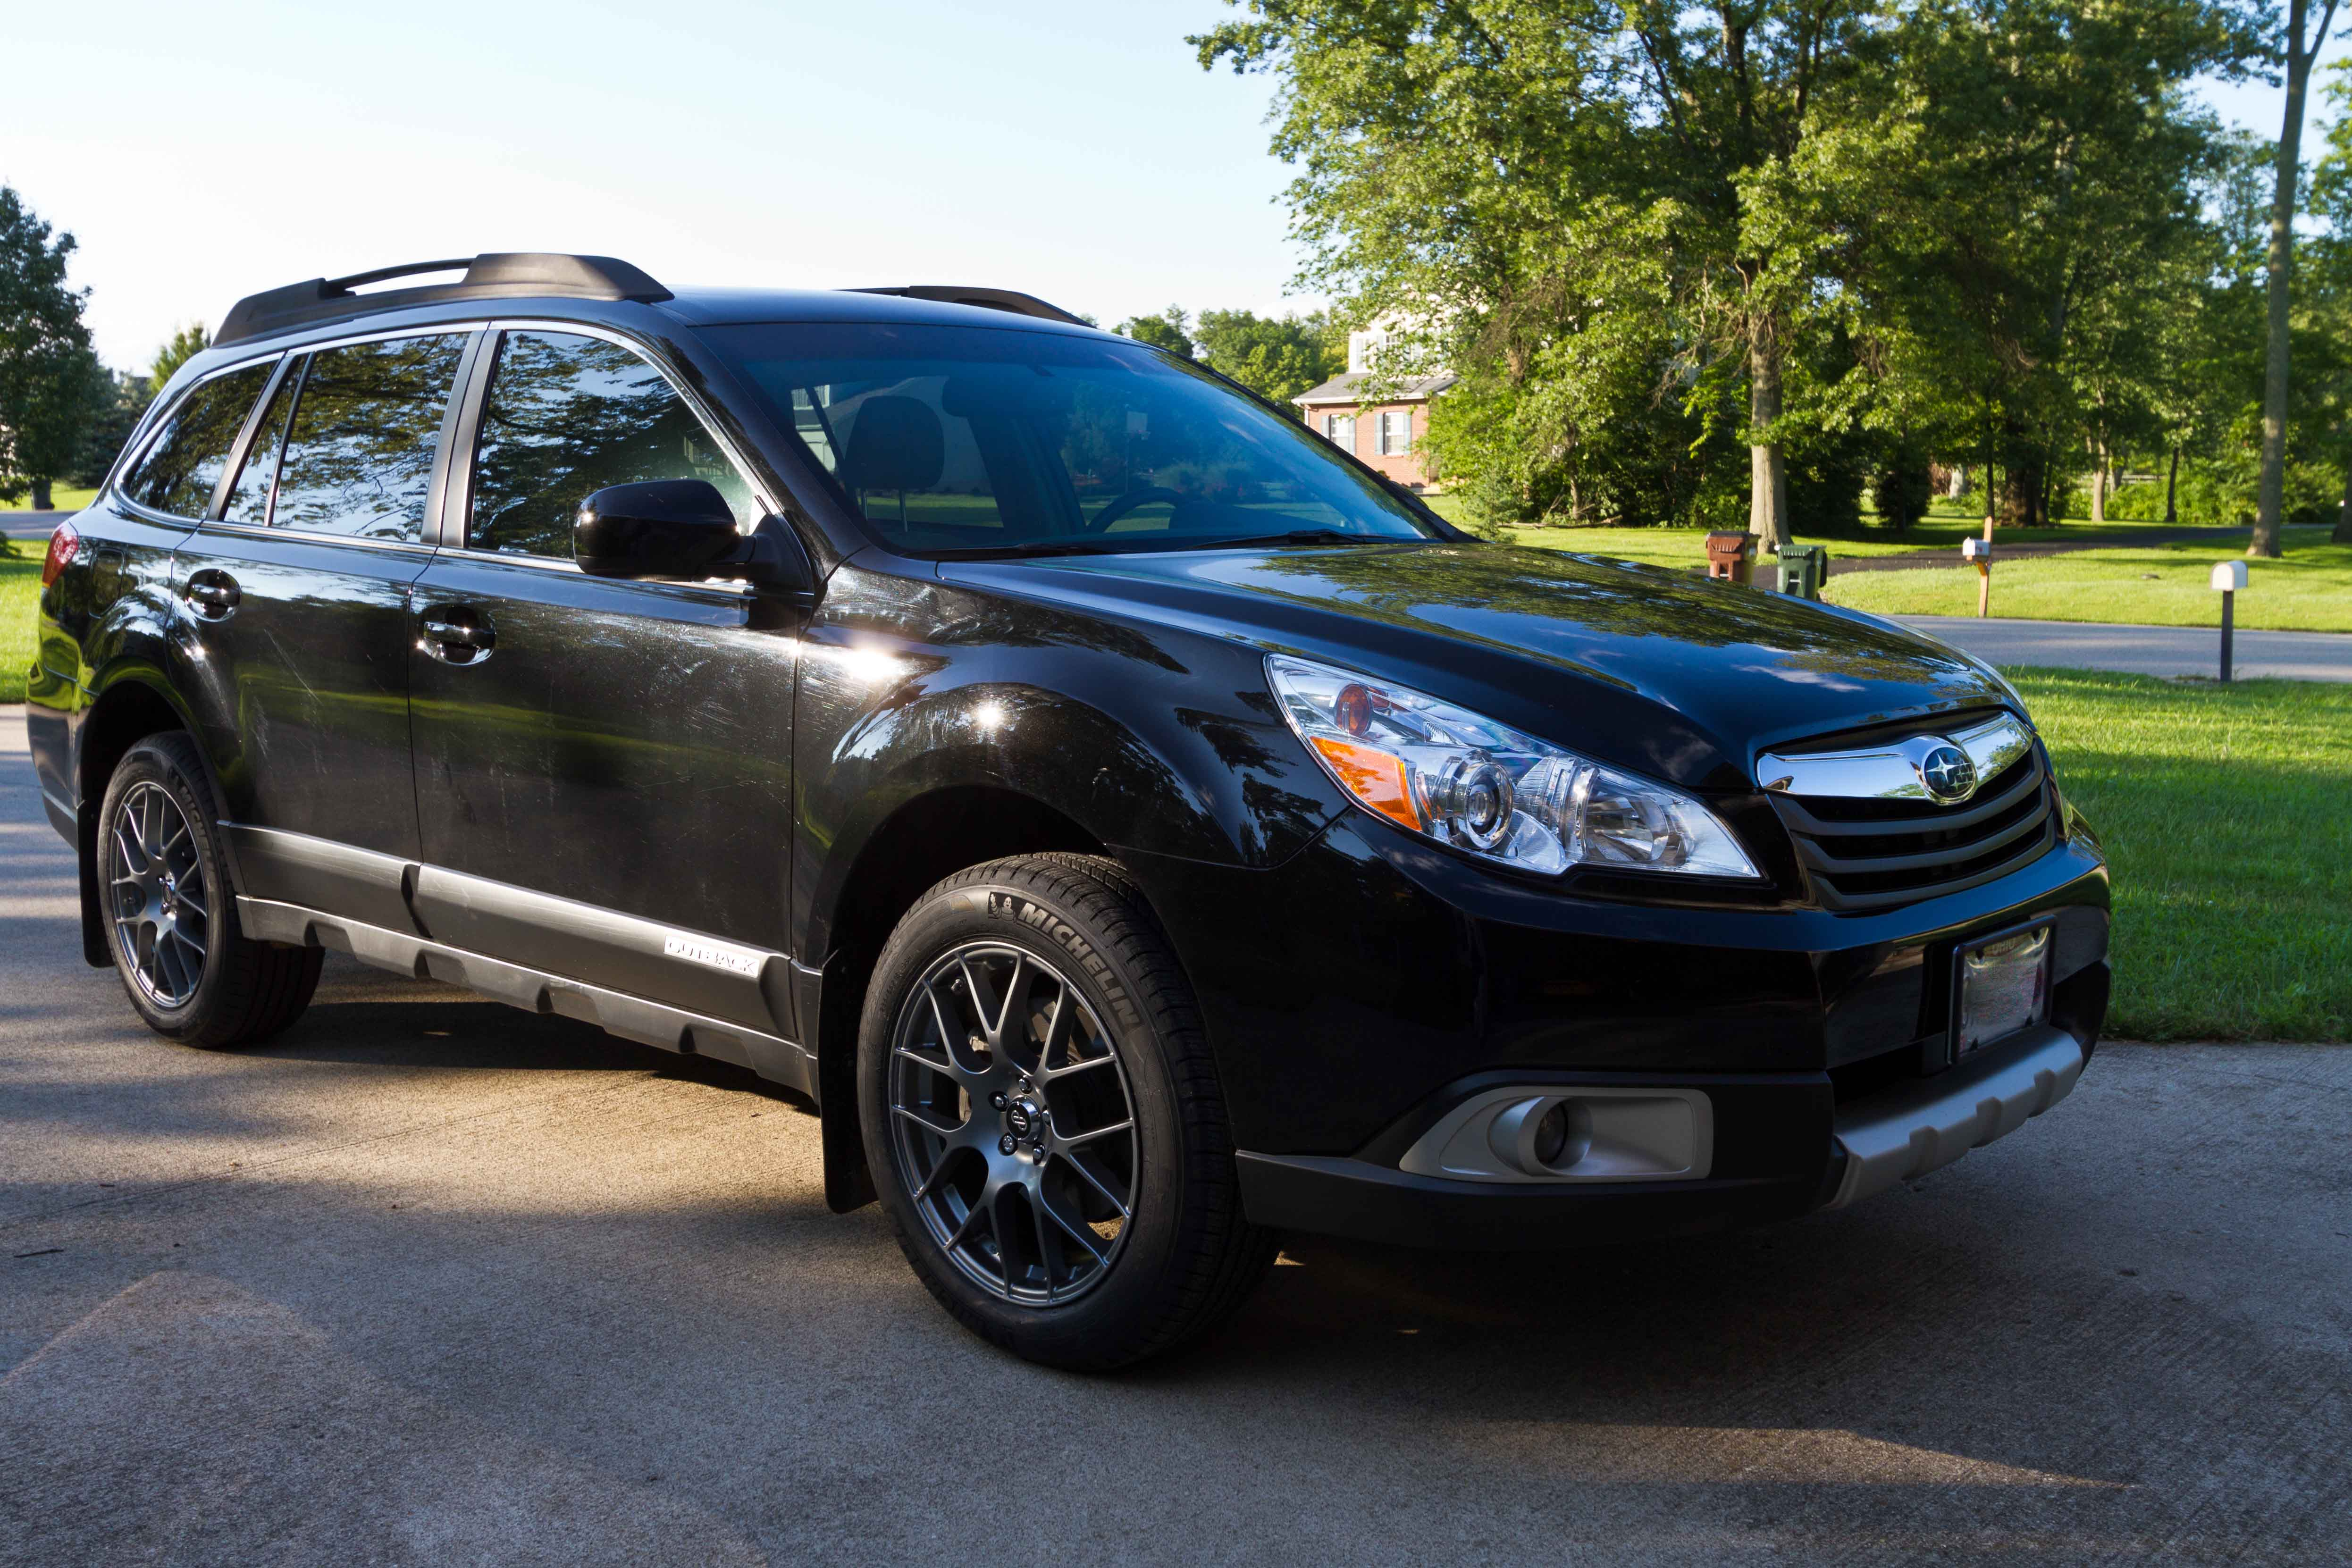 New wheels & tires. Subaru Outback Subaru Outback Forums